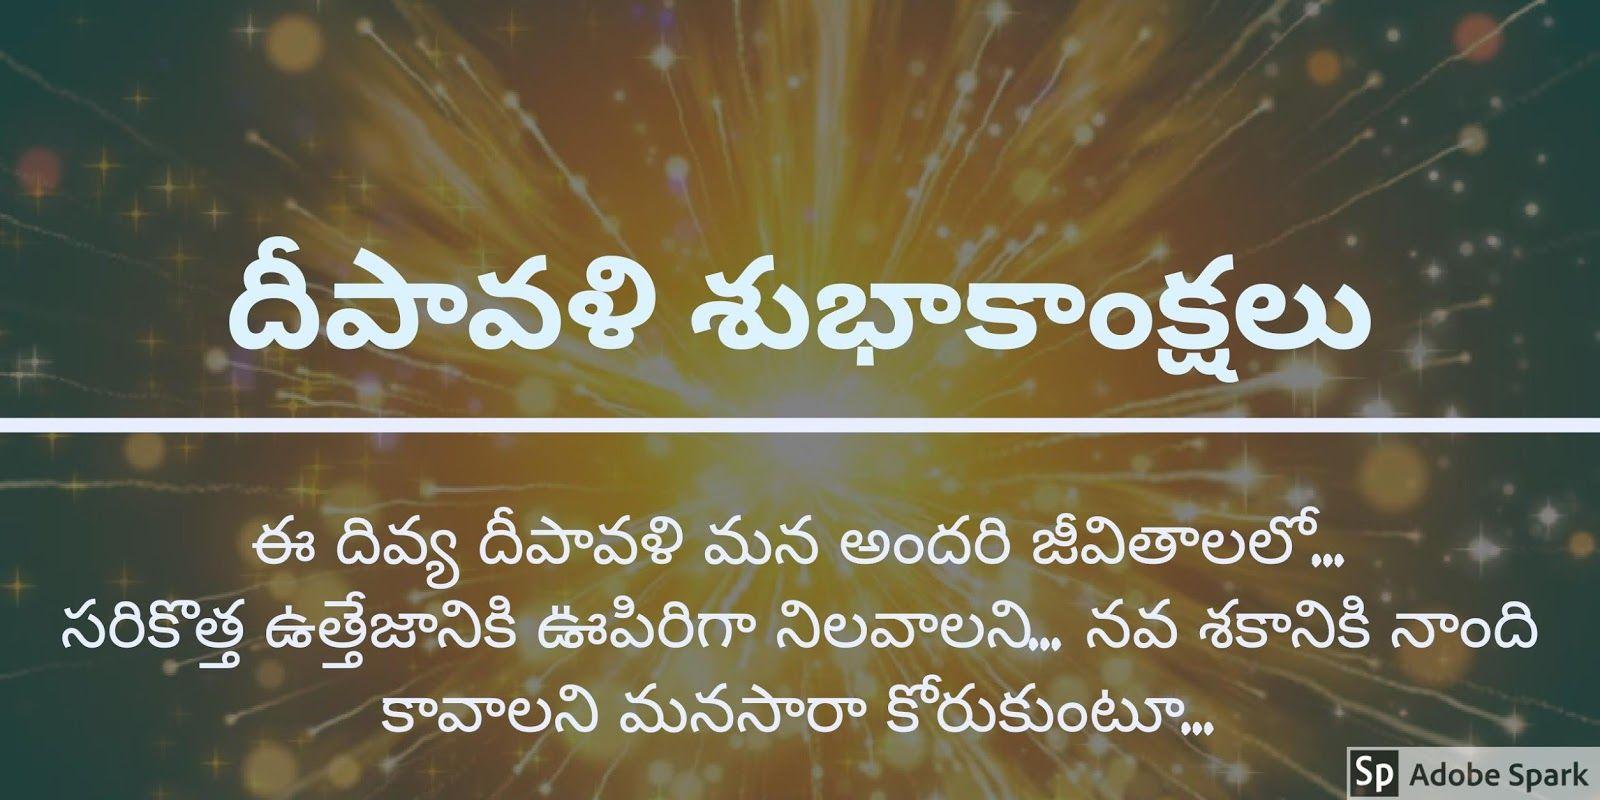 New deepavali greetings in telugu class good words xyz pinterest new deepavali greetings in telugu class m4hsunfo